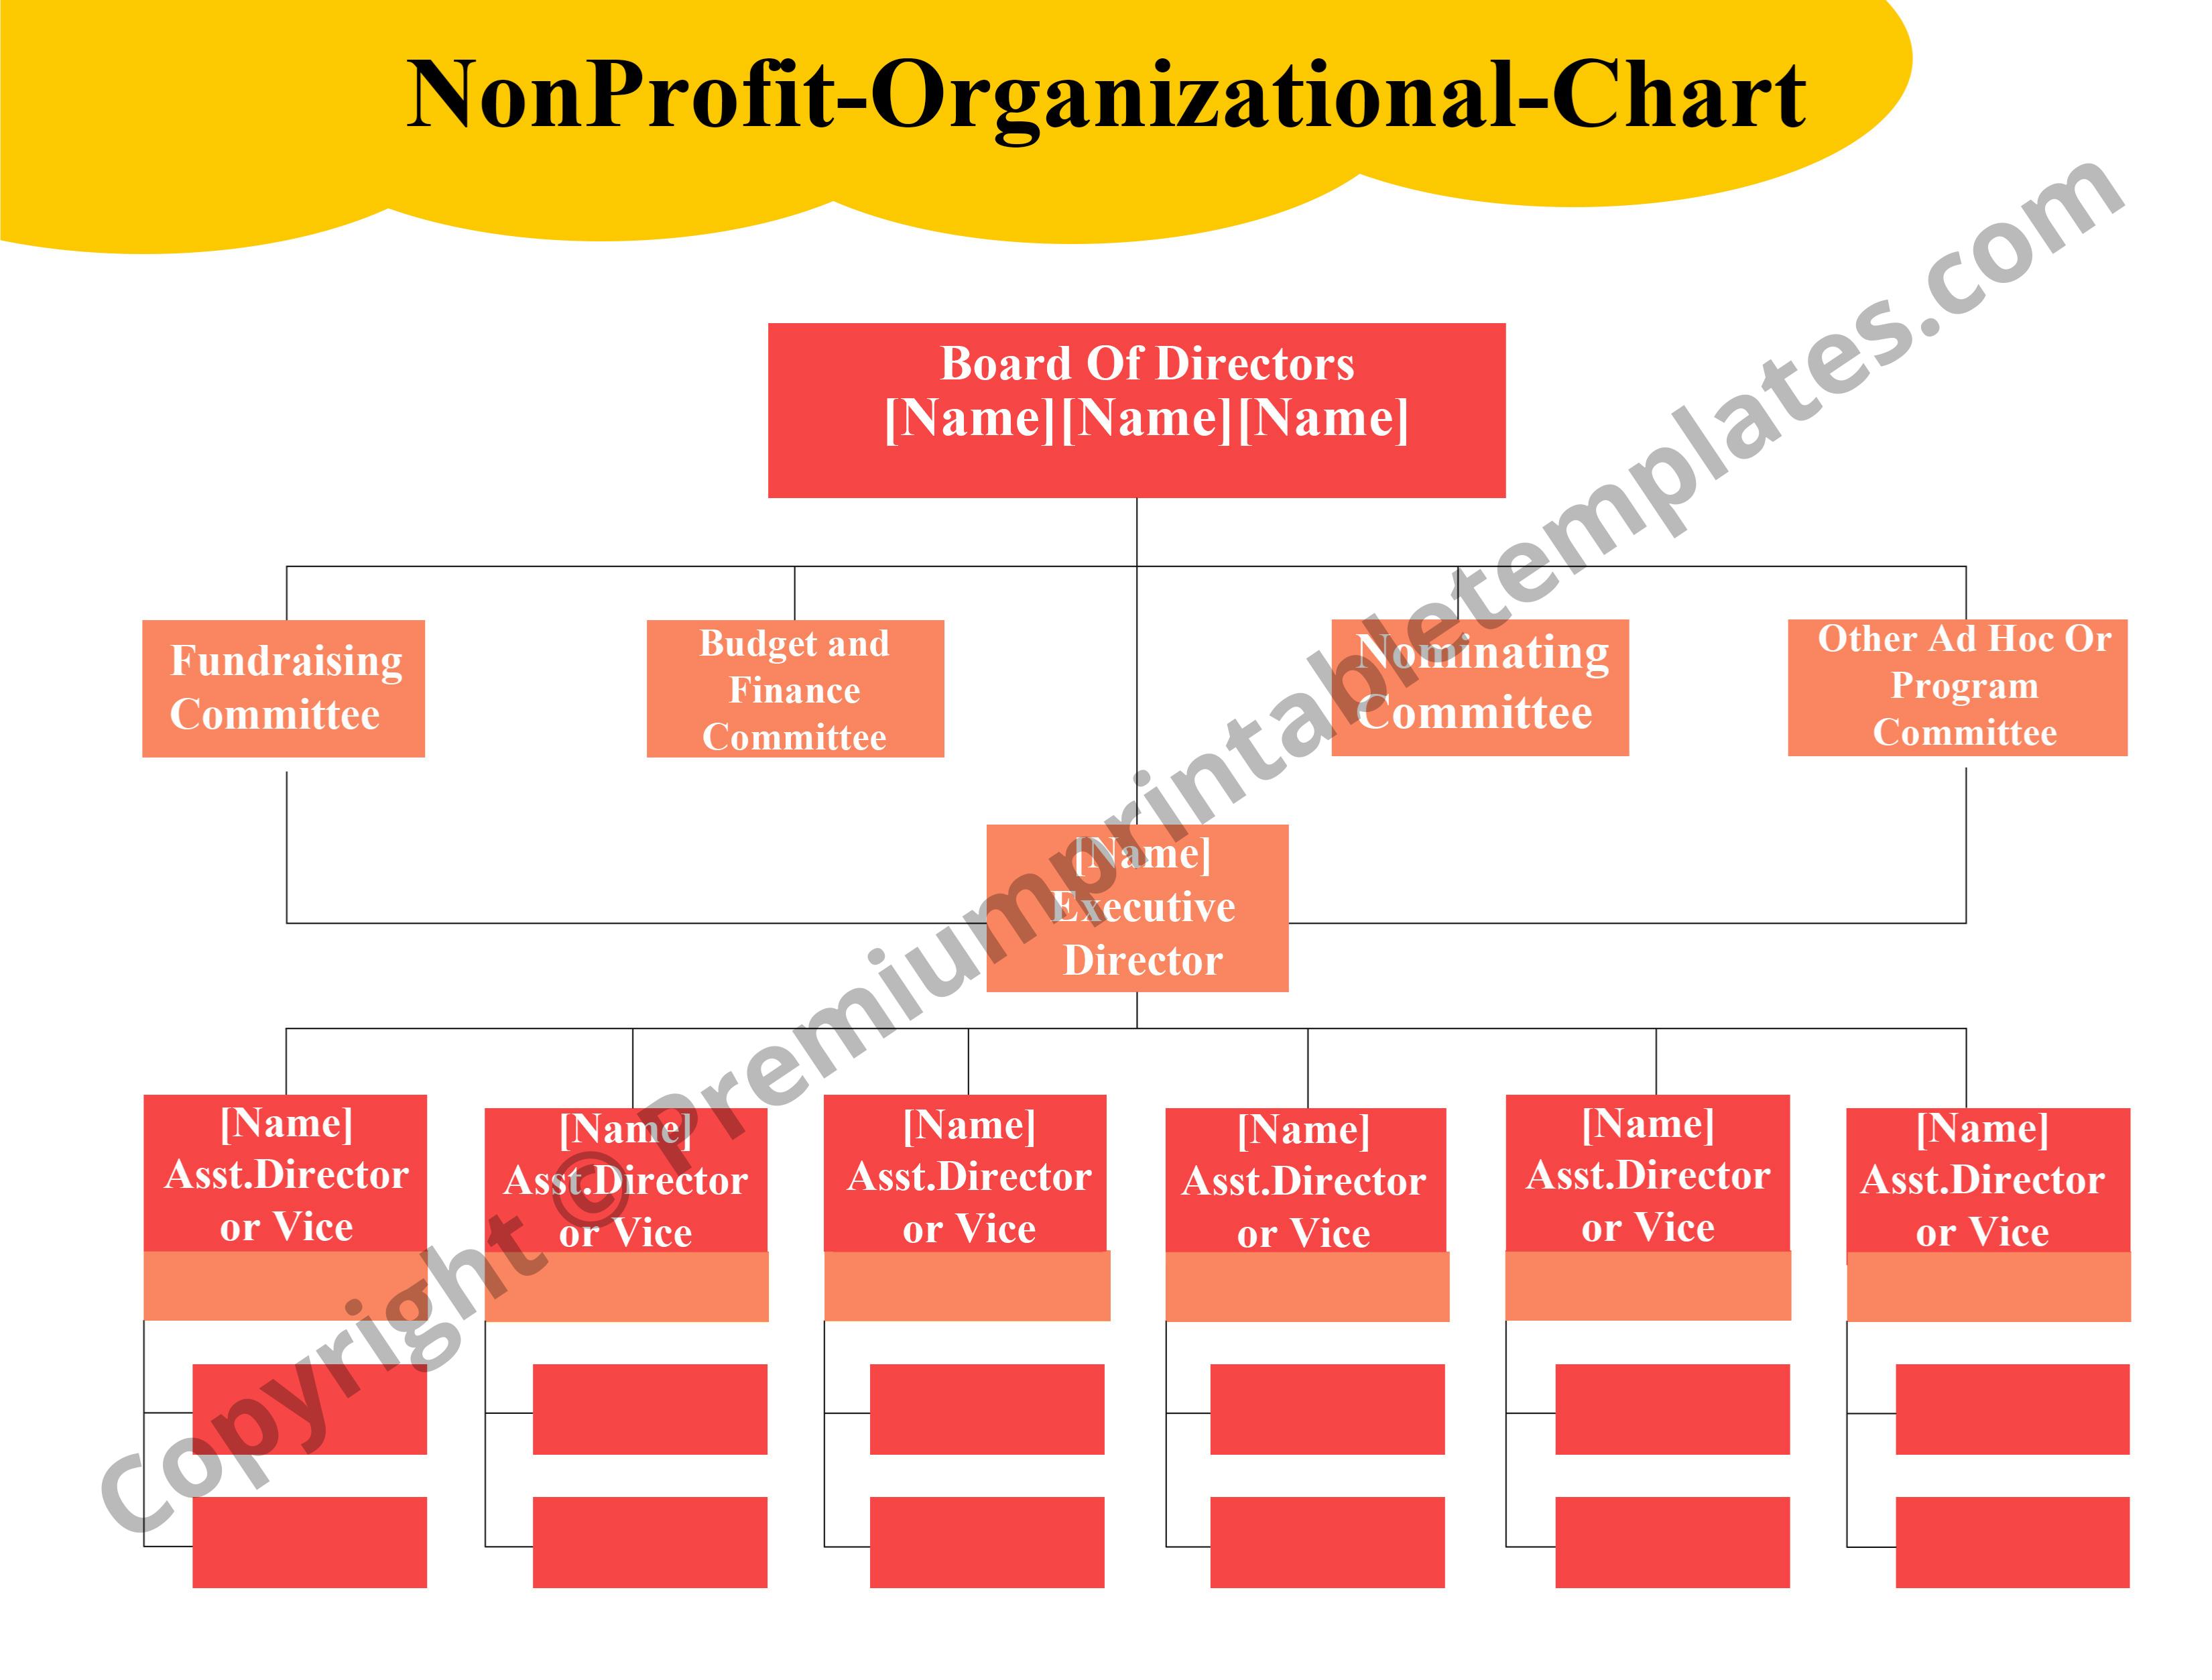 Non Profit Organizational Chart Pack Of 5 Premium Printable Templates